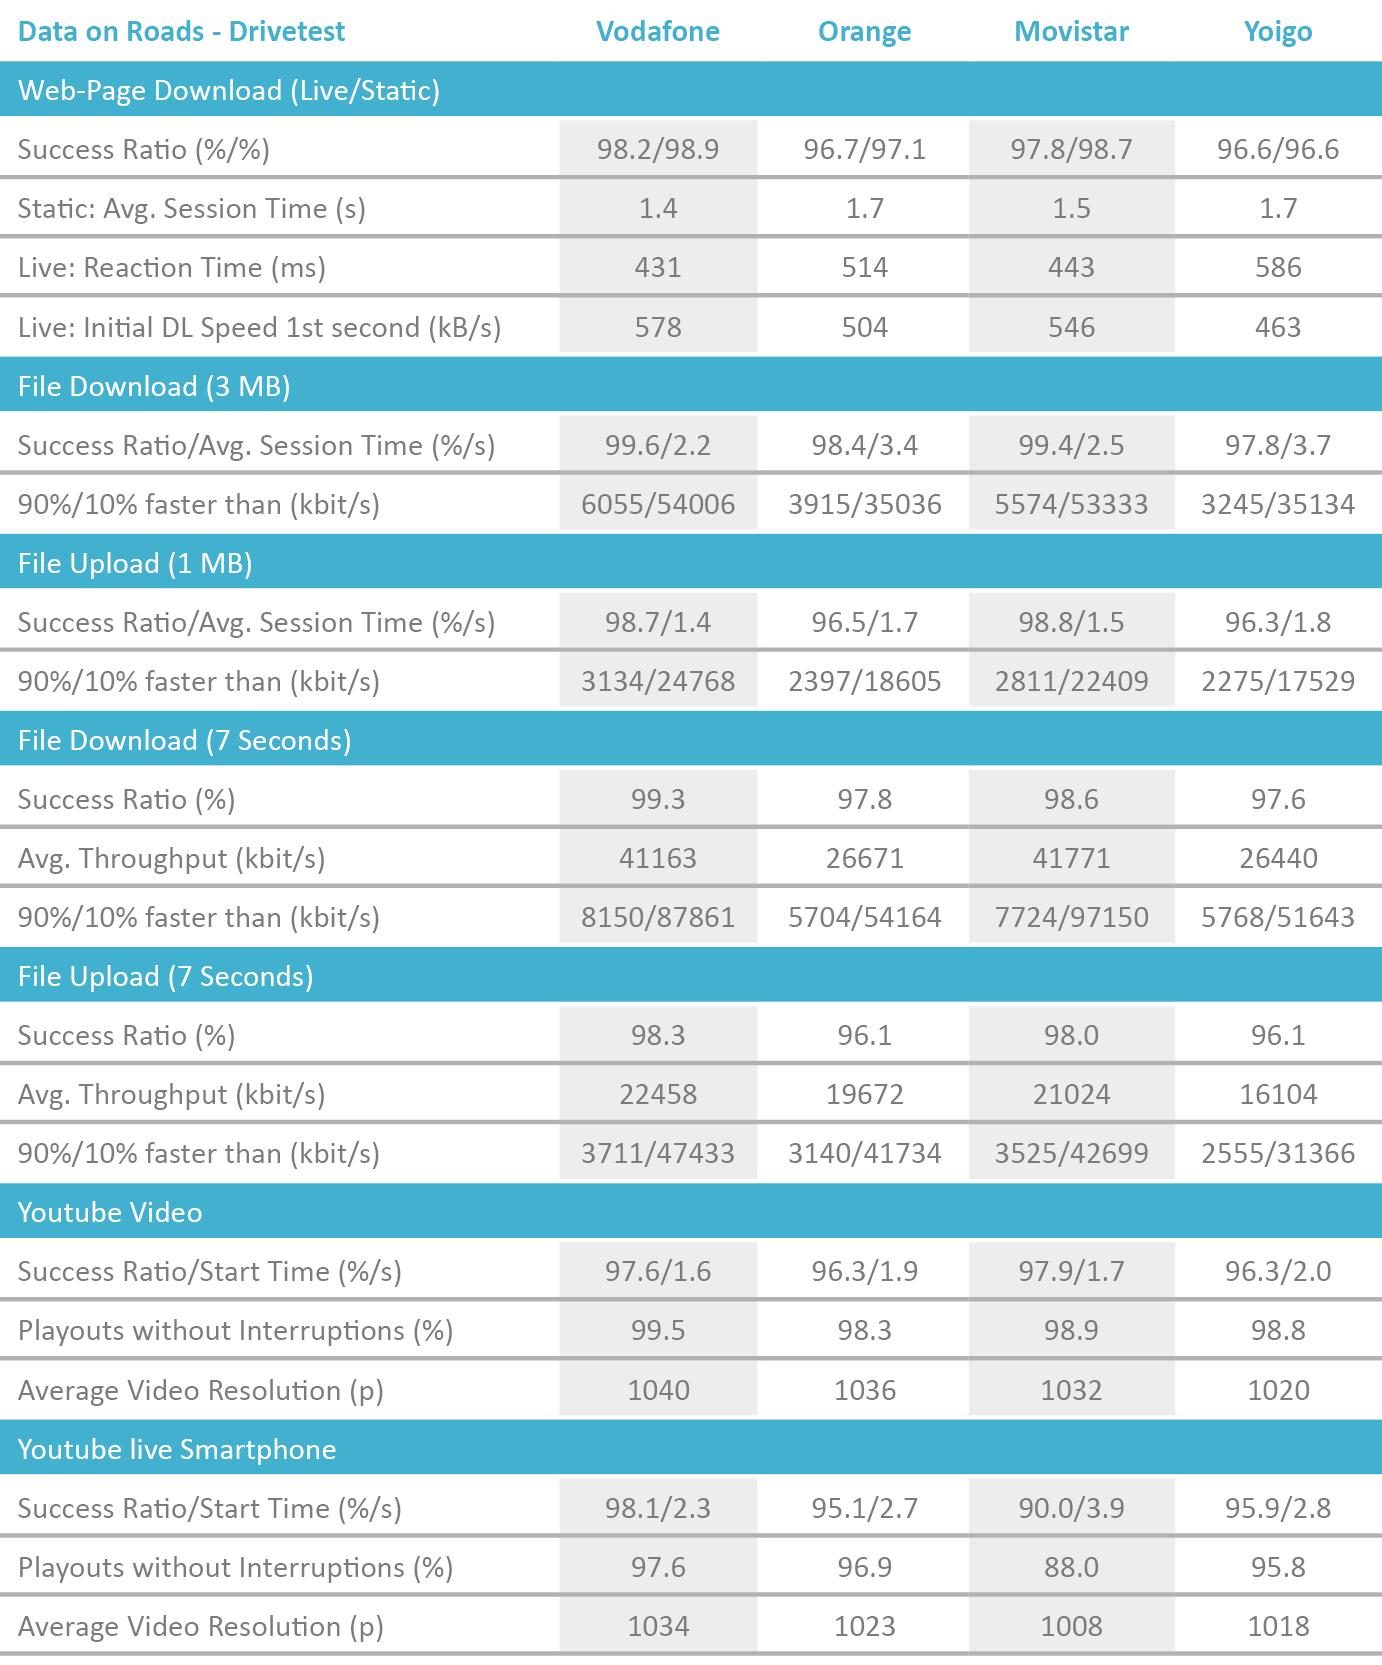 ES_Tabelle_DataRoads_Drivetest_2018_englisch.png